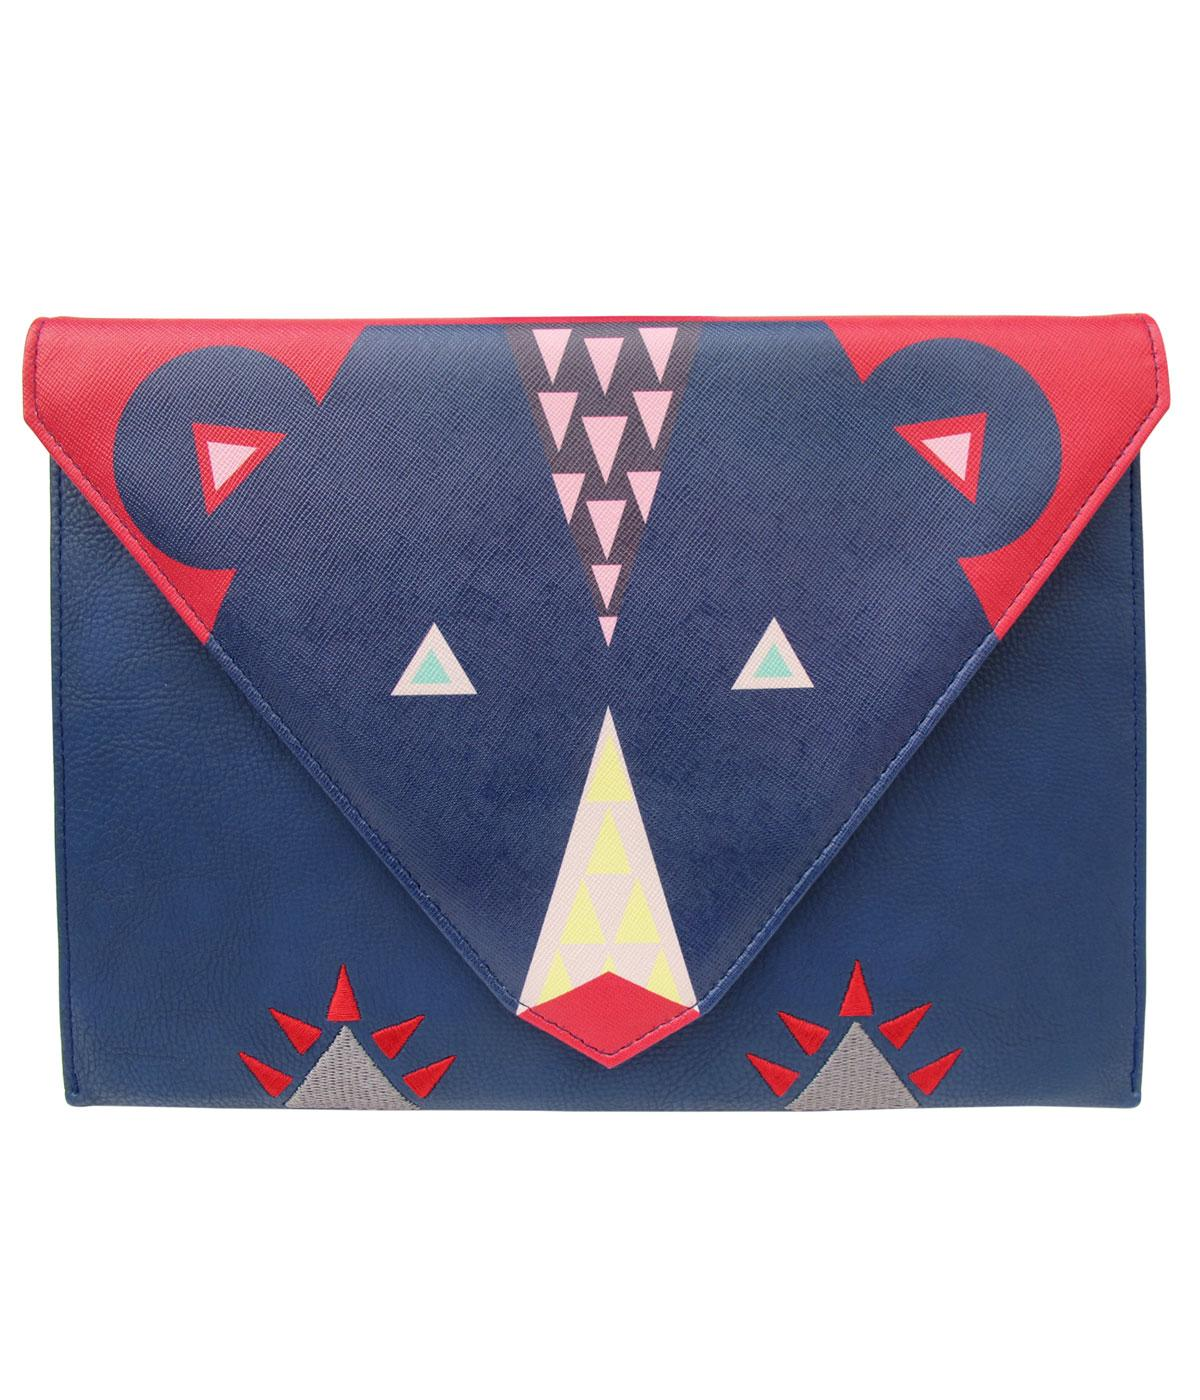 Dakota Bear DISASTER DESIGNS 1960s Mod Clutch Bag